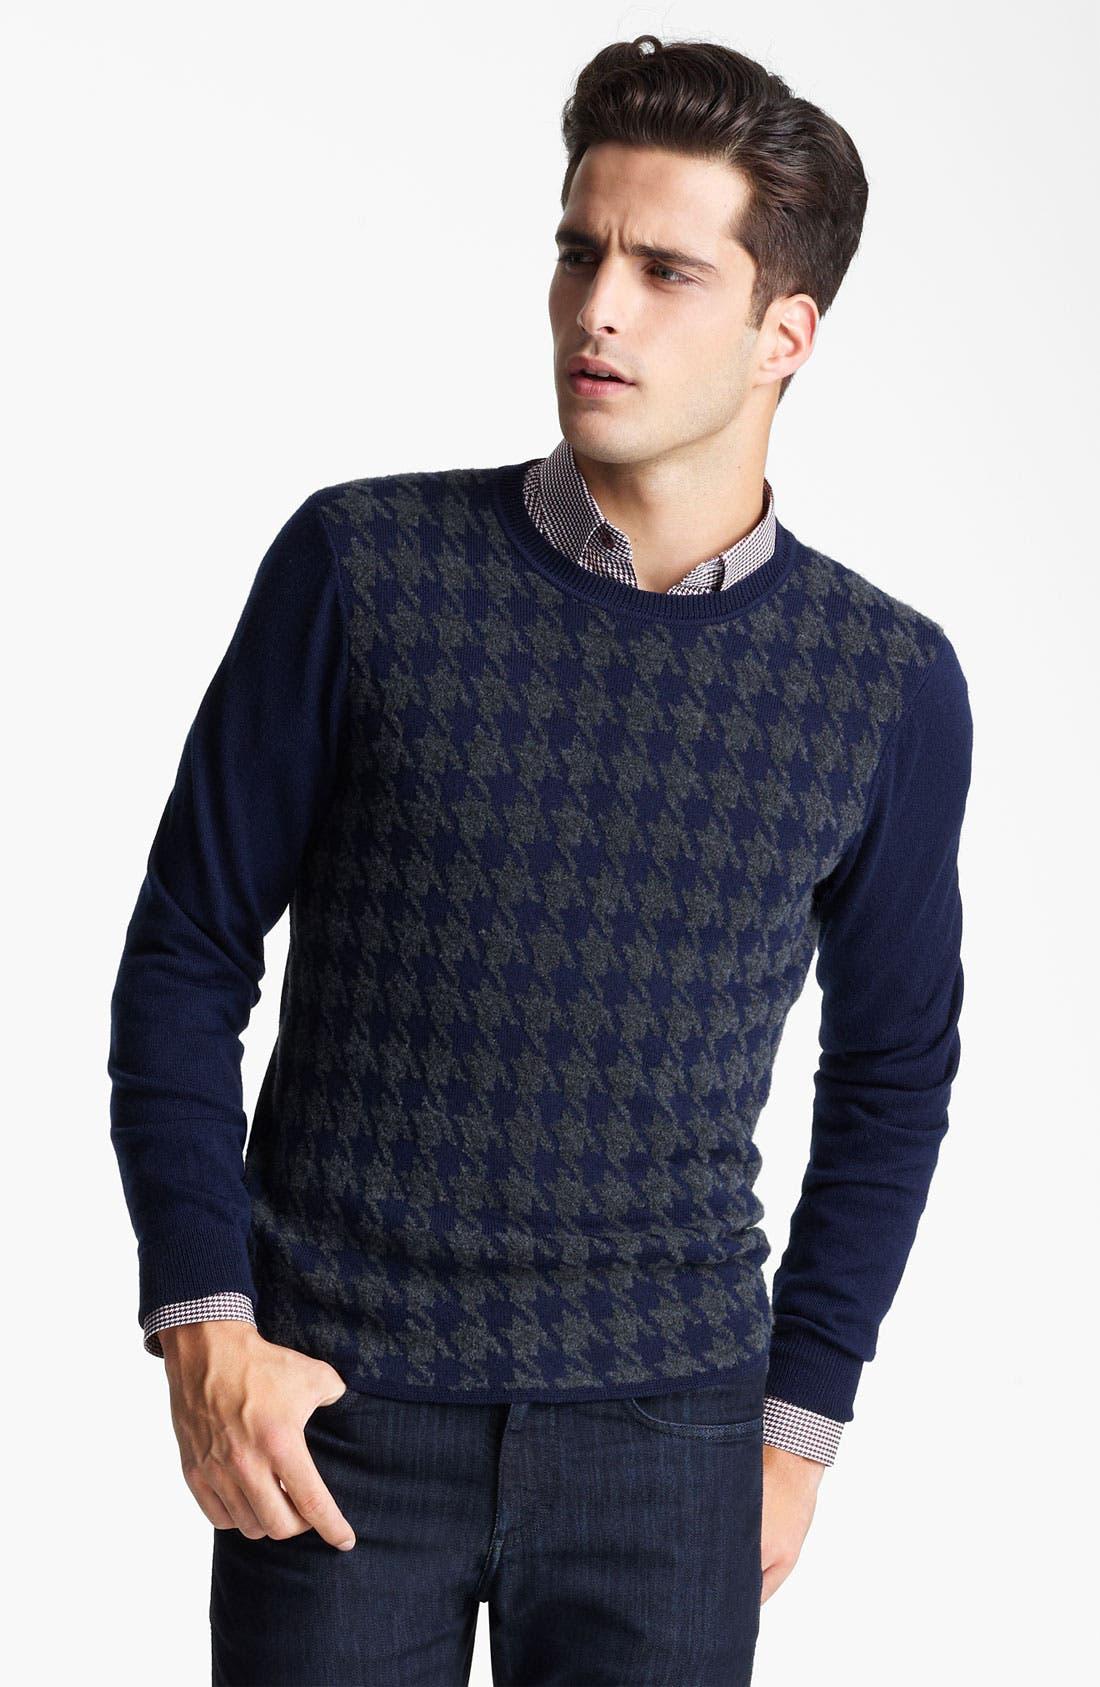 Z ZEGNA, Houndstooth Crewneck Sweater, Main thumbnail 1, color, 418